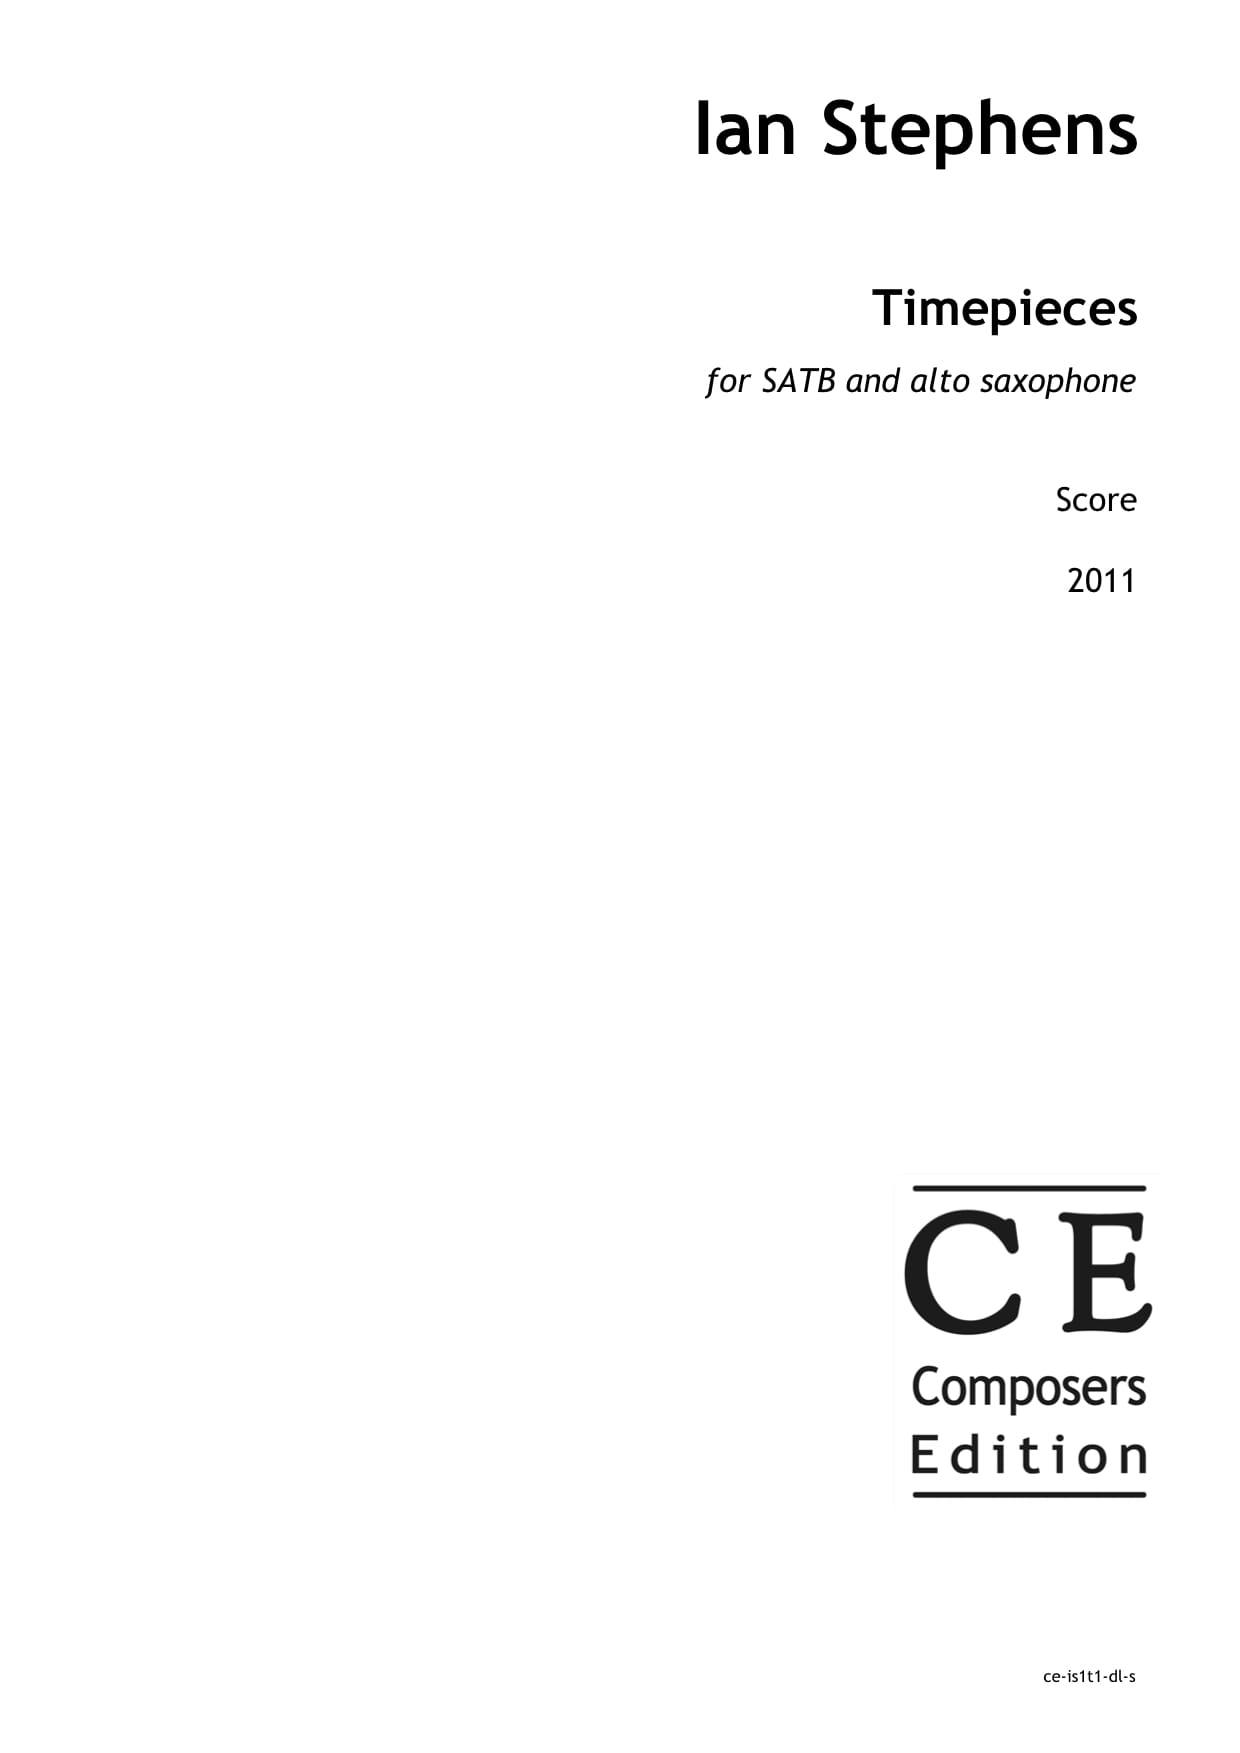 Ian Stephens: Timepieces for SATB choir and alto saxophone